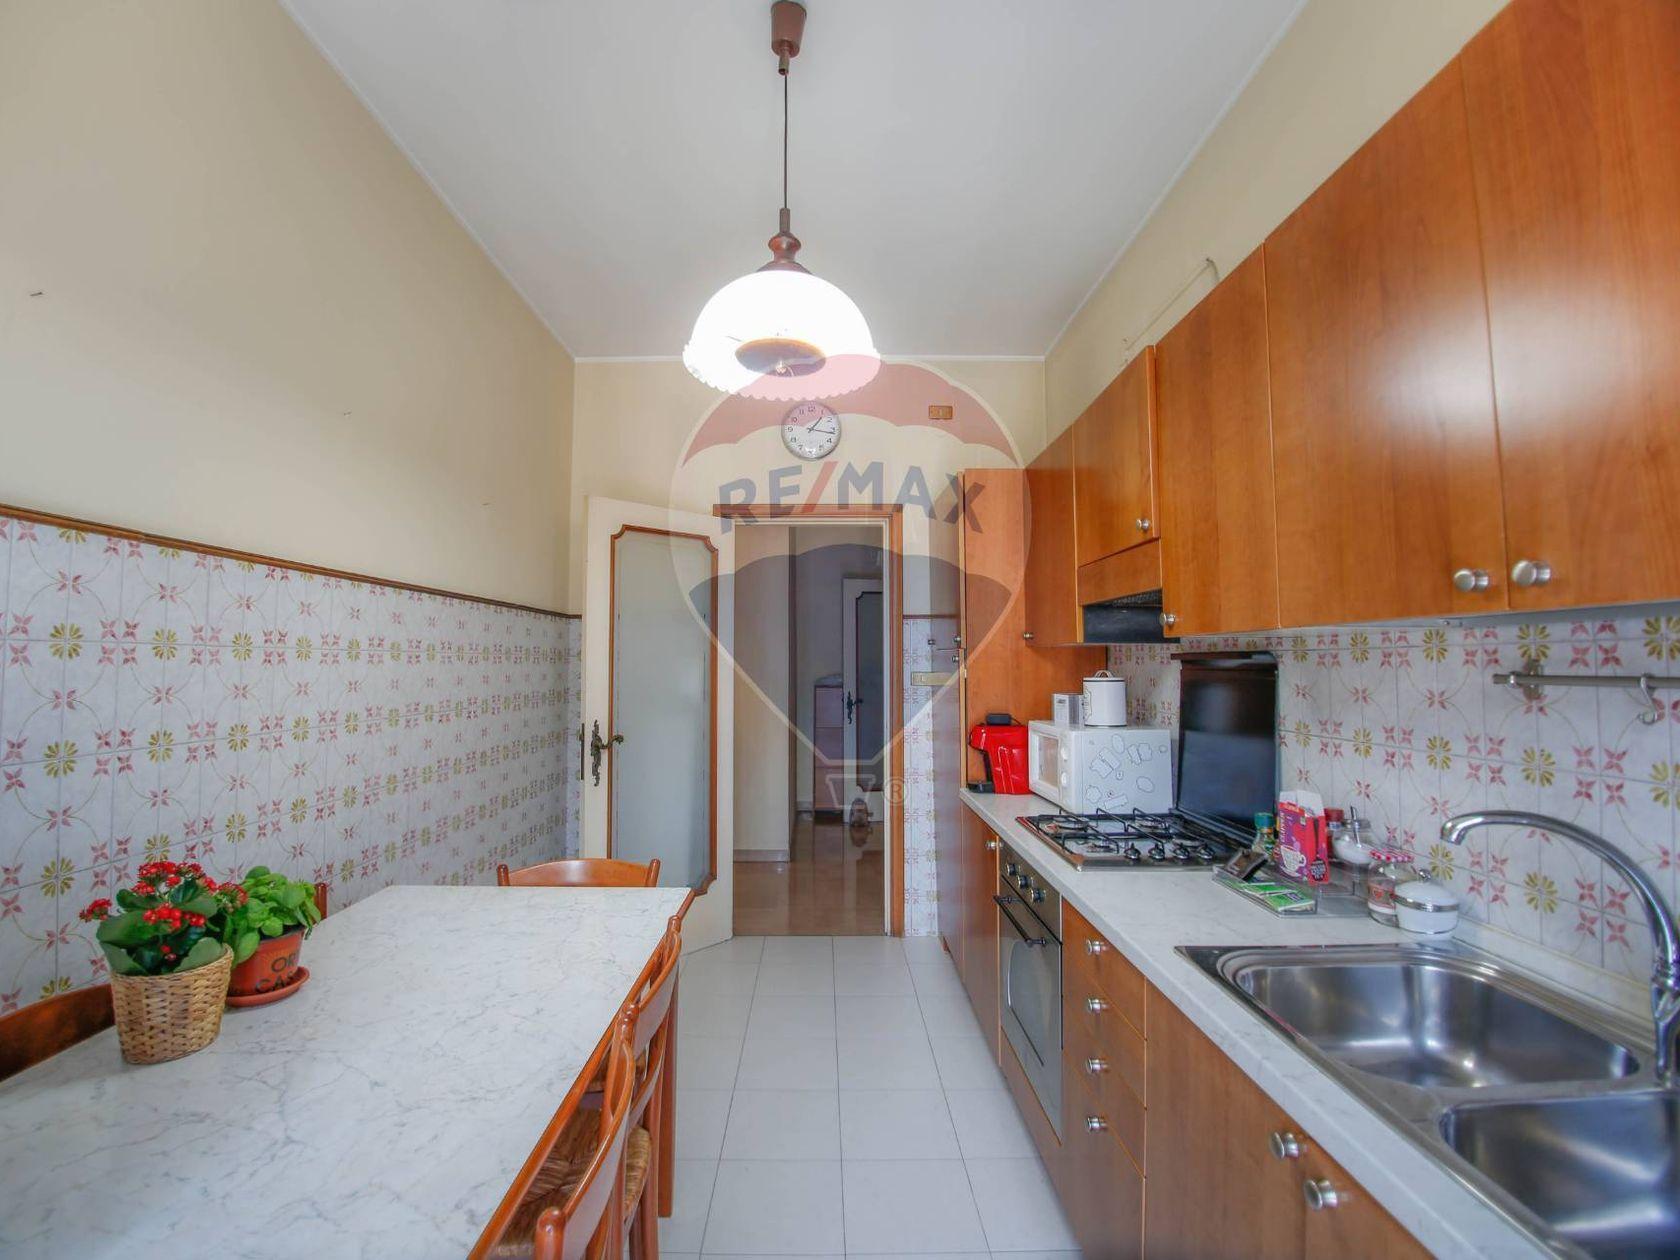 Appartamento Zona Ospedale, Pescara, PE Vendita - Foto 11